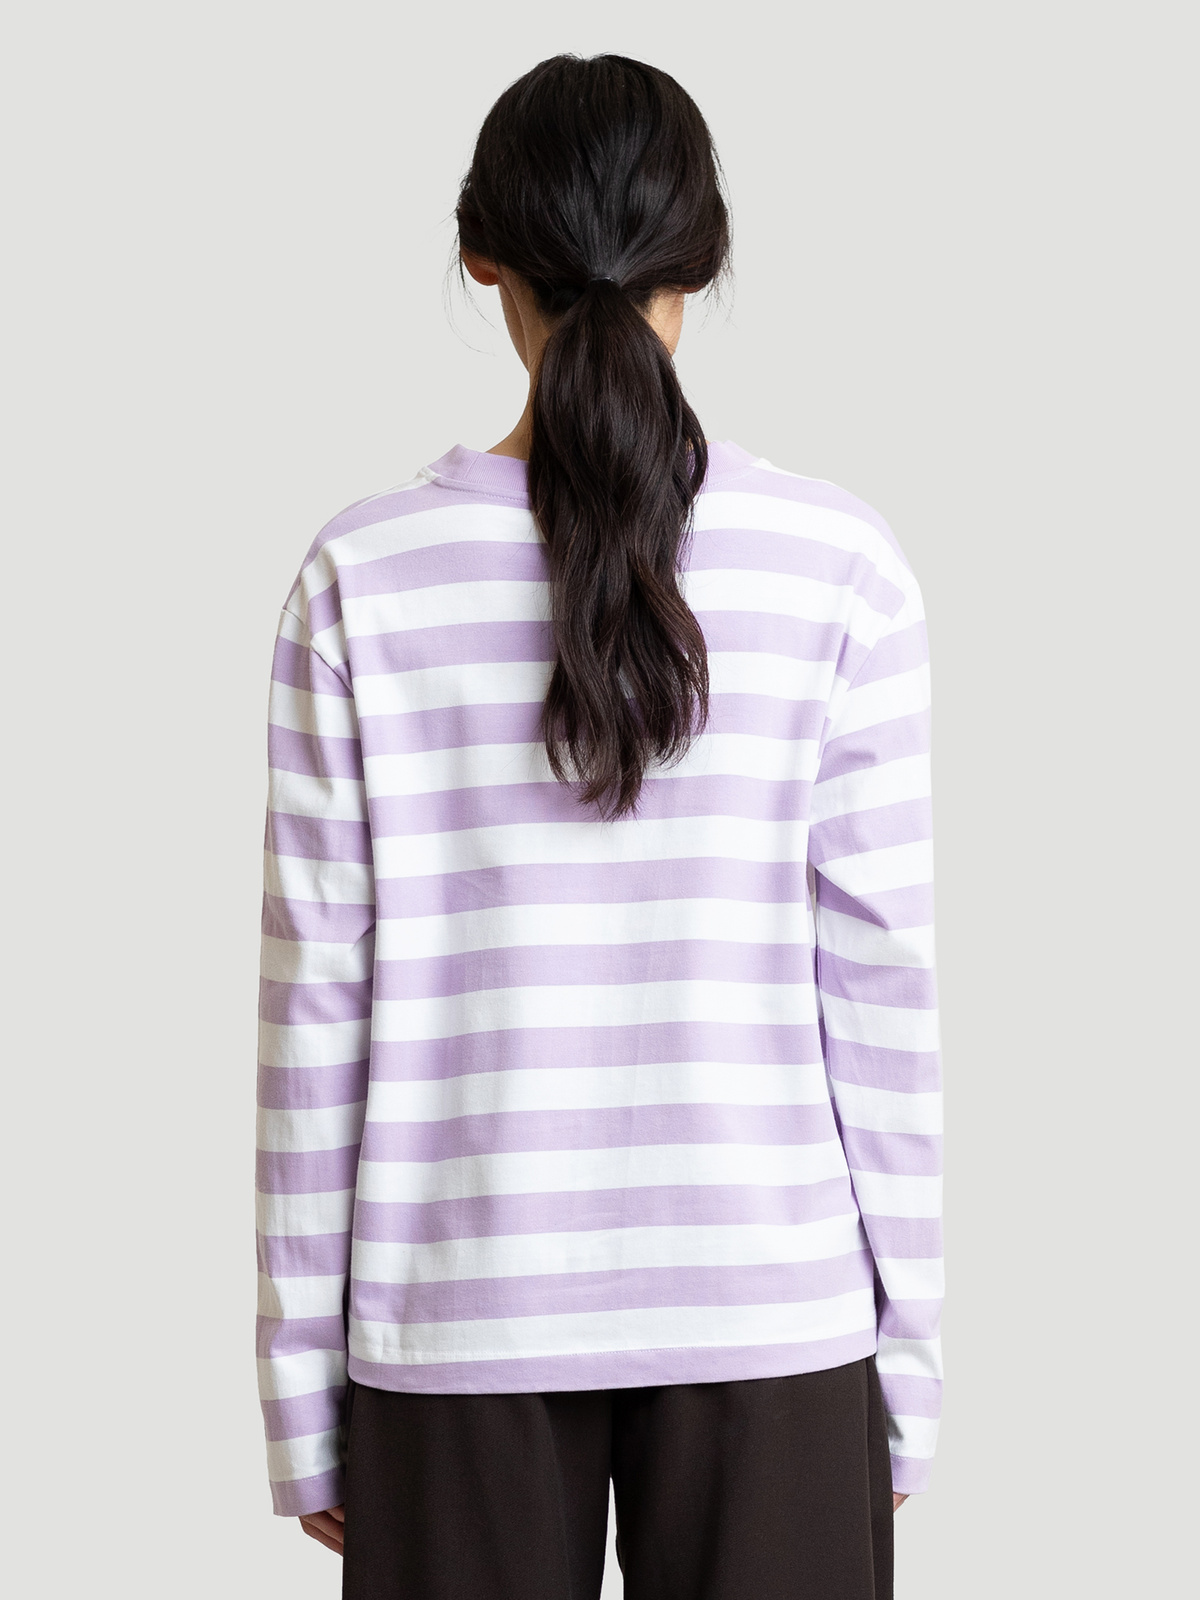 Hanger Striped Longsleeve Lilac White 11